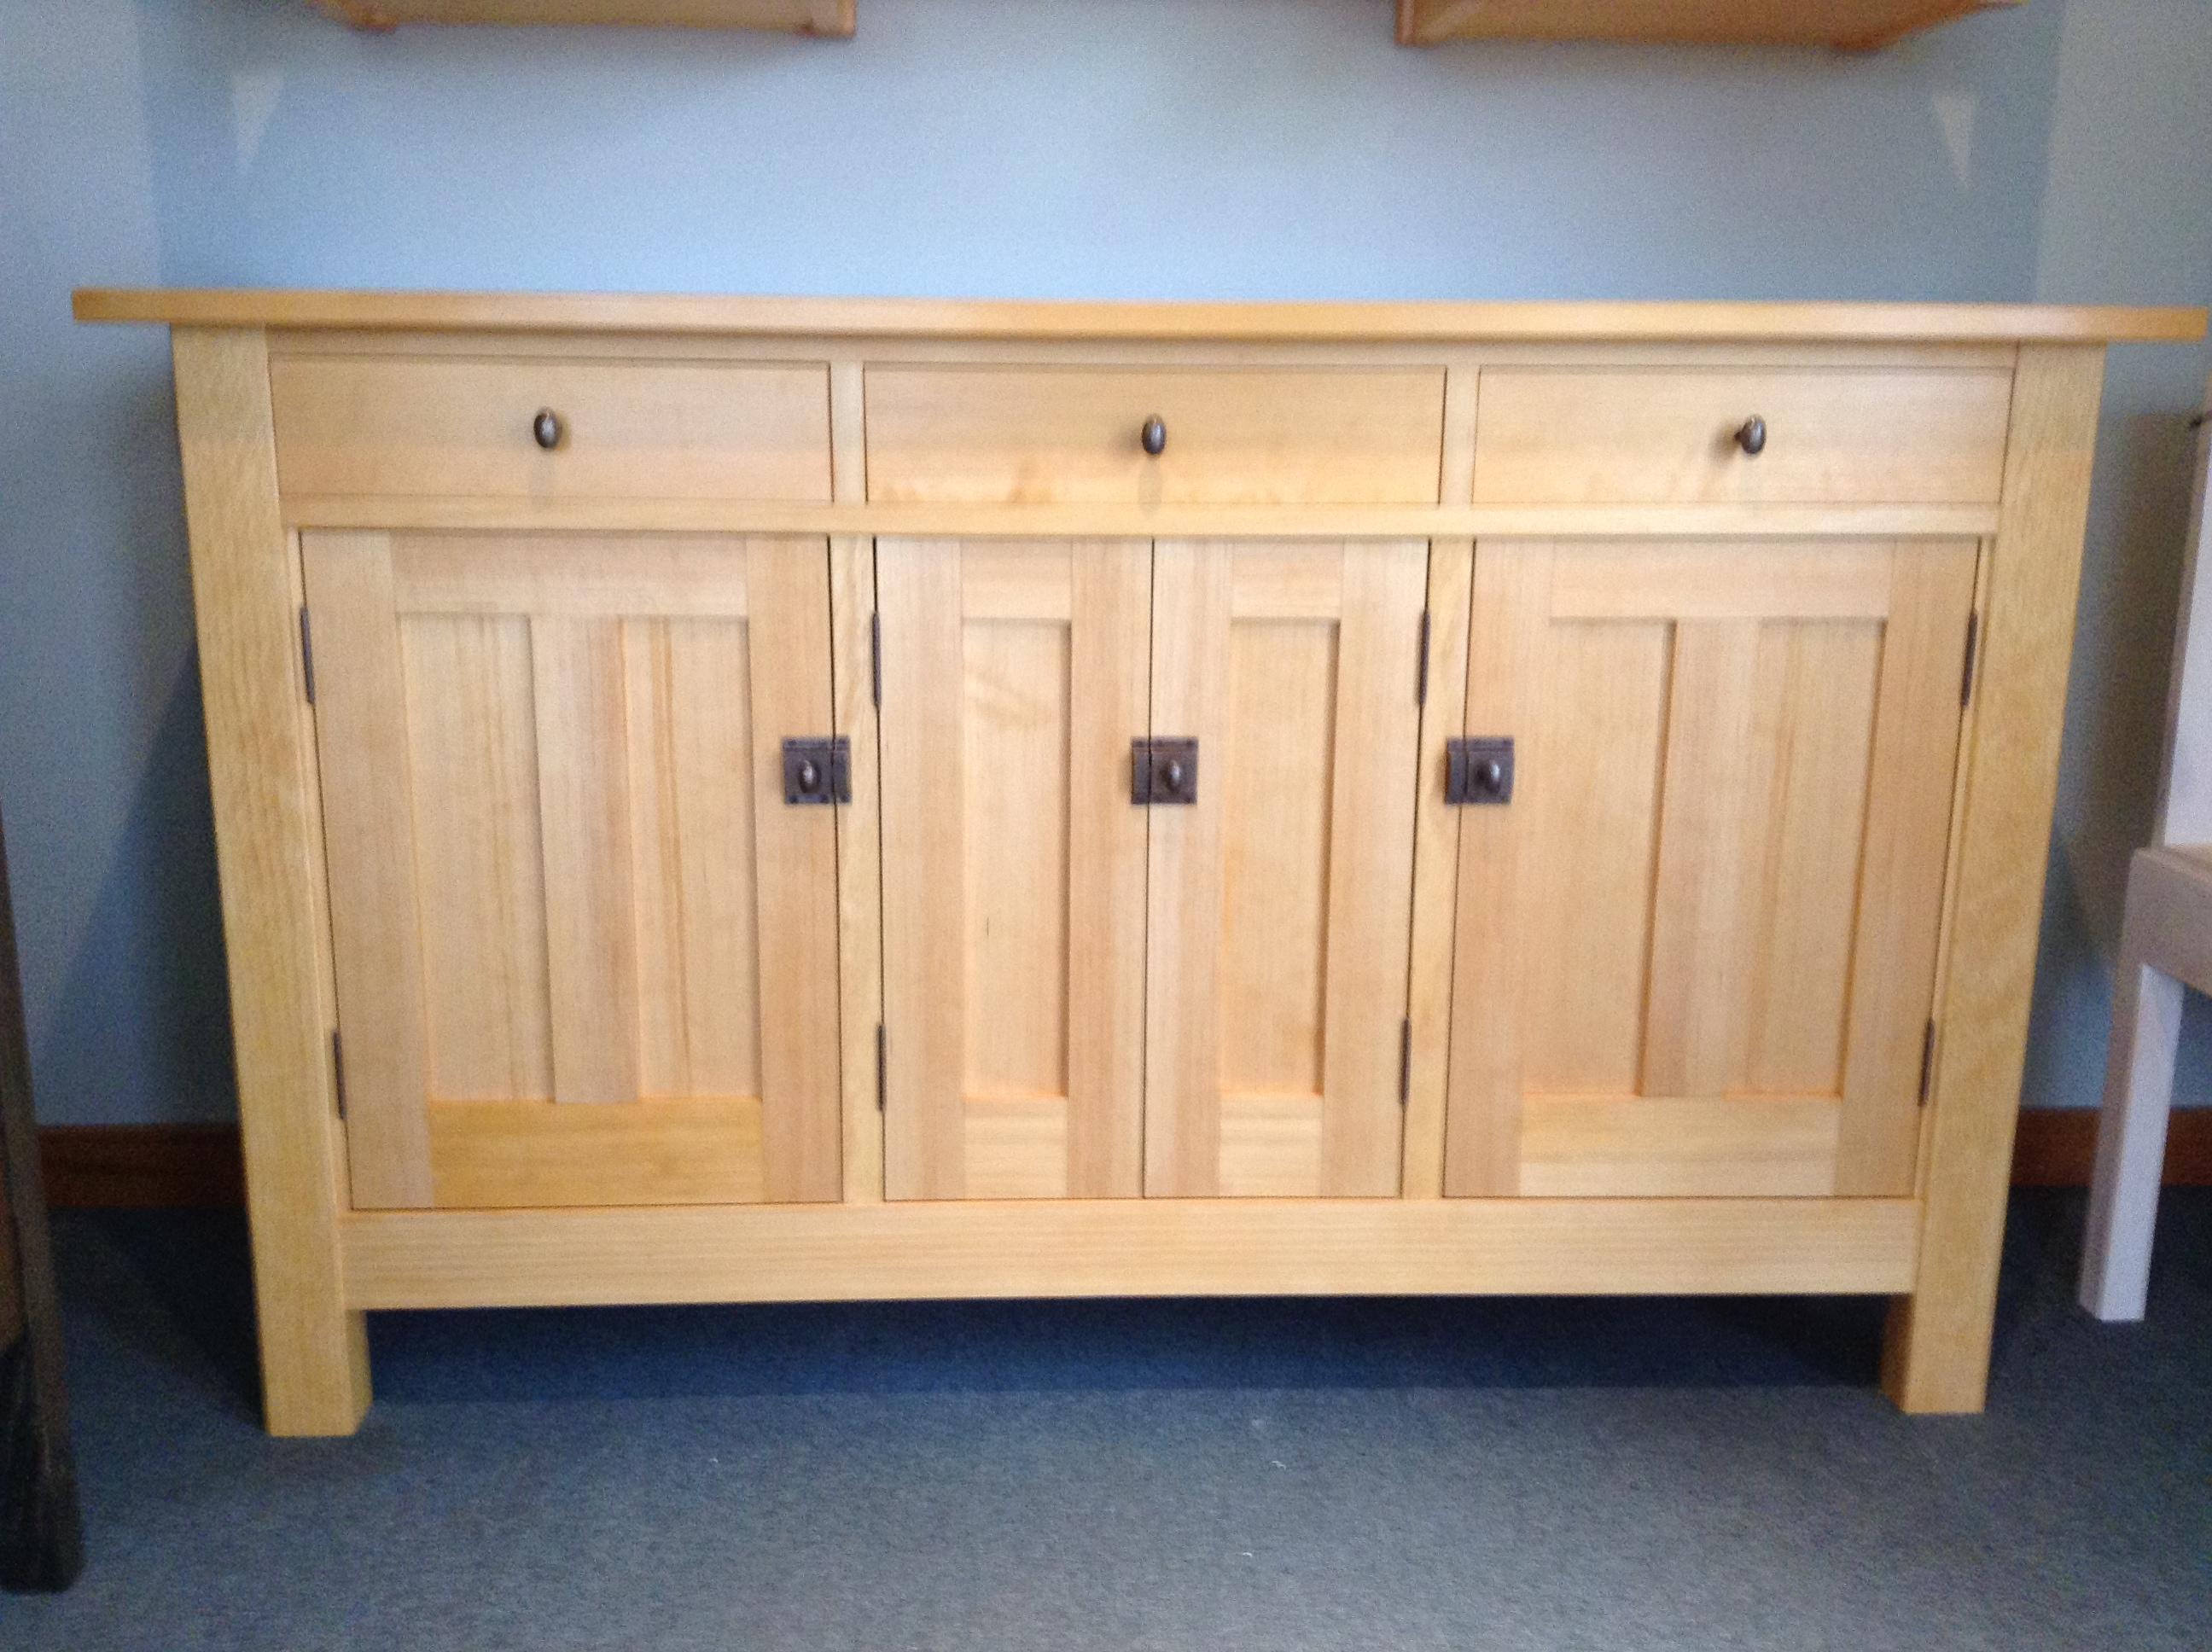 pine kitchen bench duck egg blue wall tiles arts & crafts in white - selkirk craftsman furniture ...